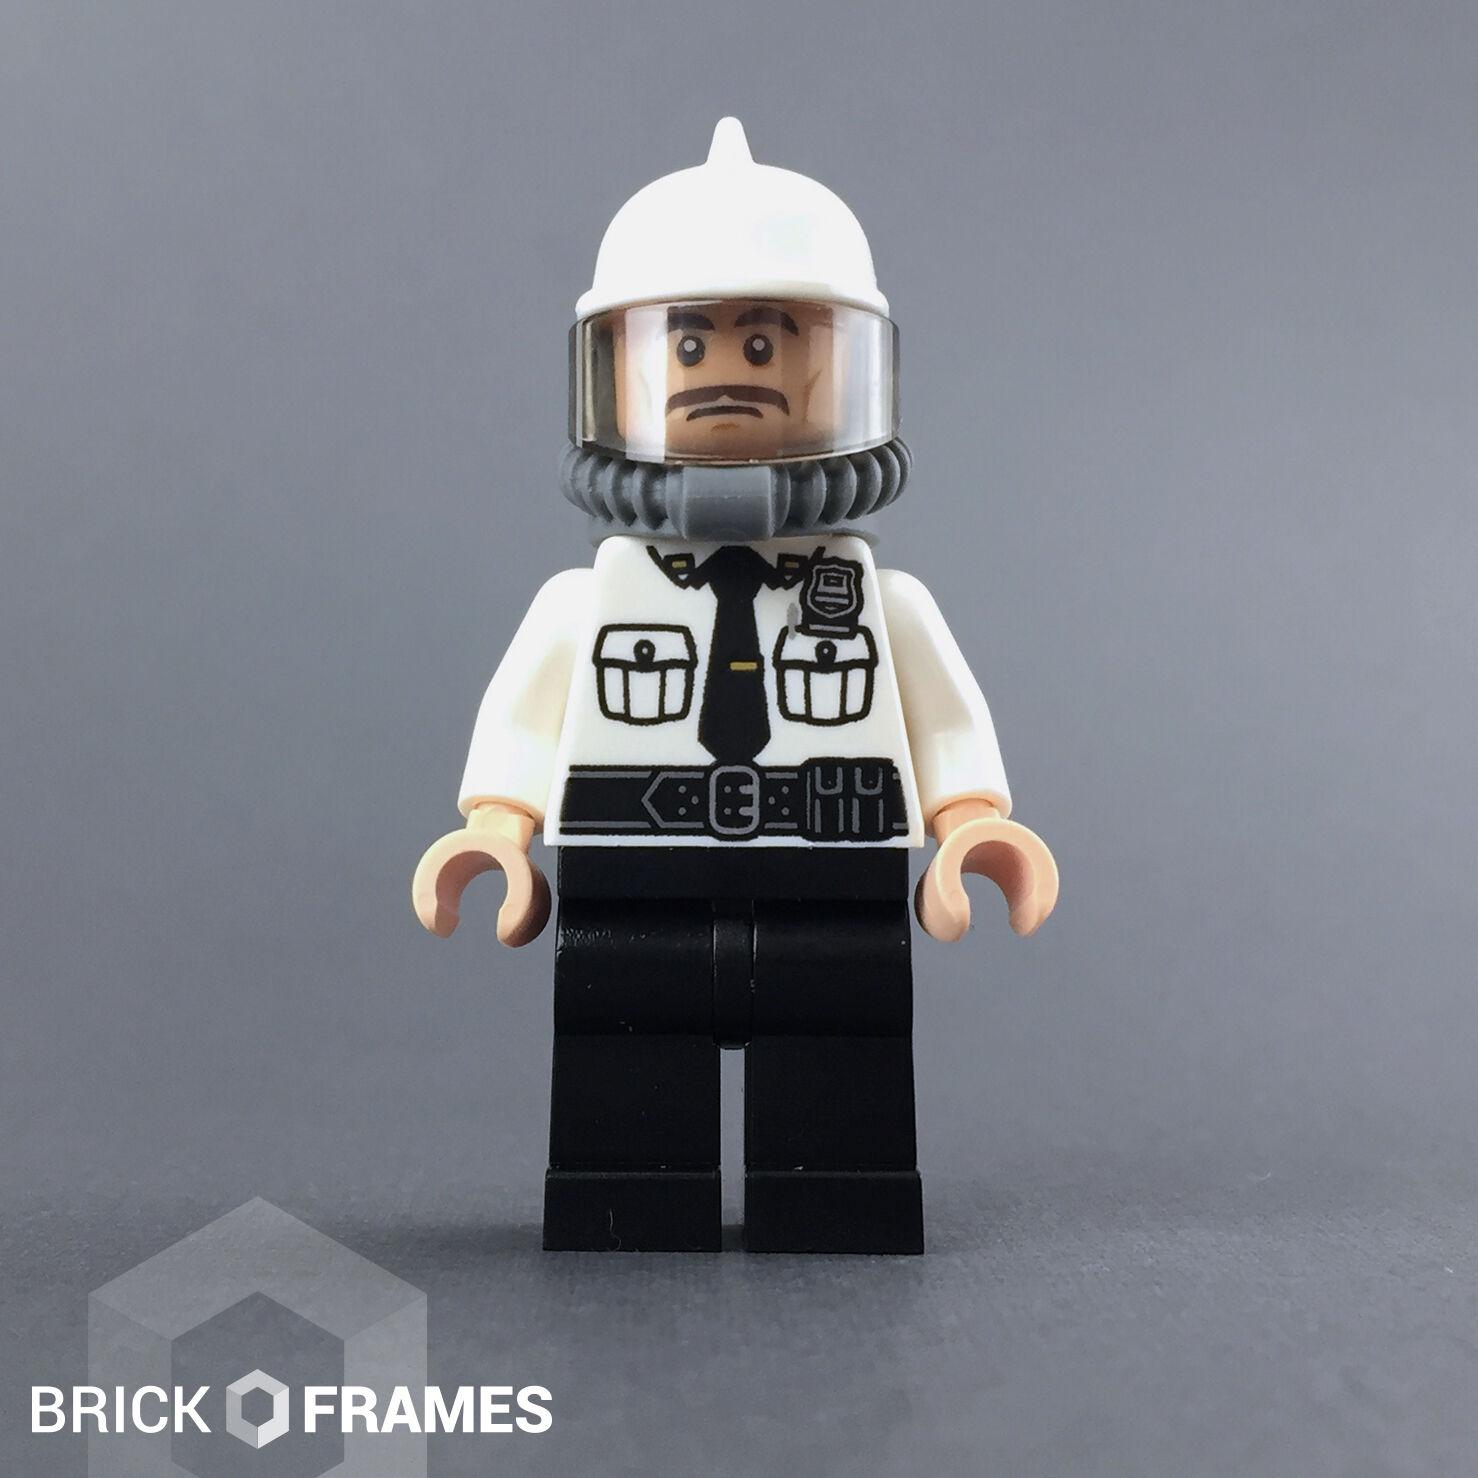 Security Guard | Brickipedia | FANDOM powered by Wikia